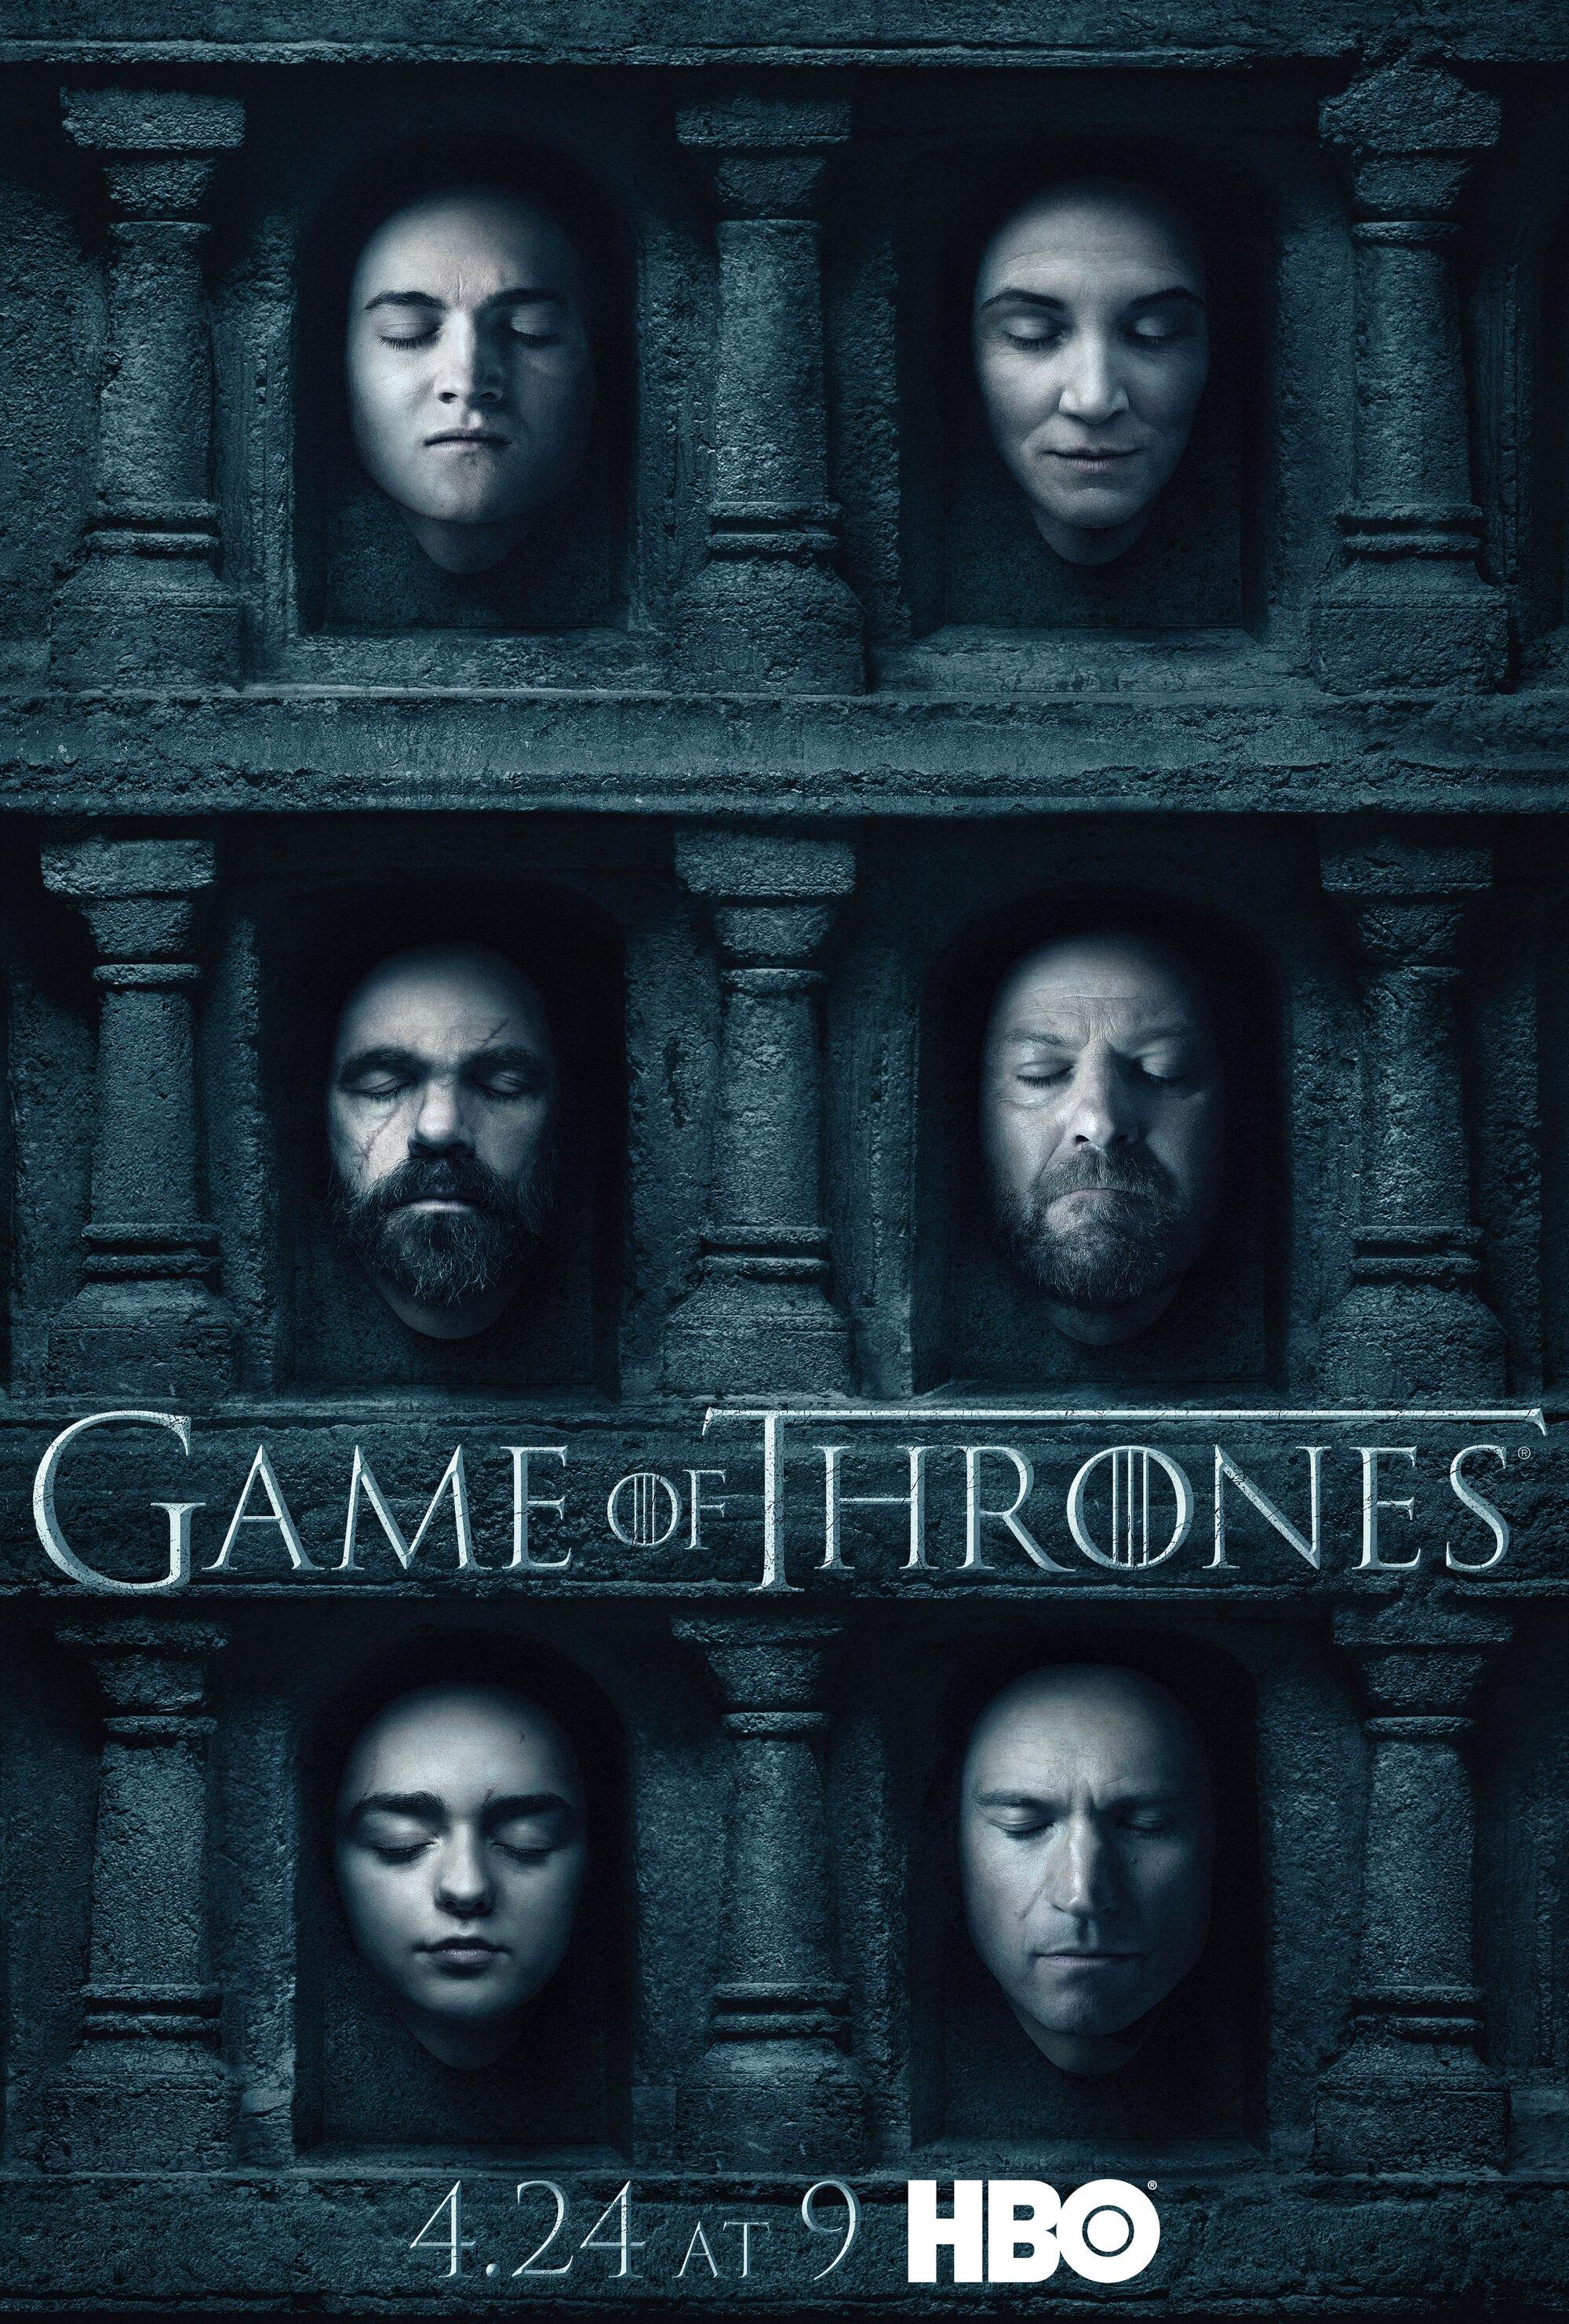 Game of thrones season 7 episode 8 9 10